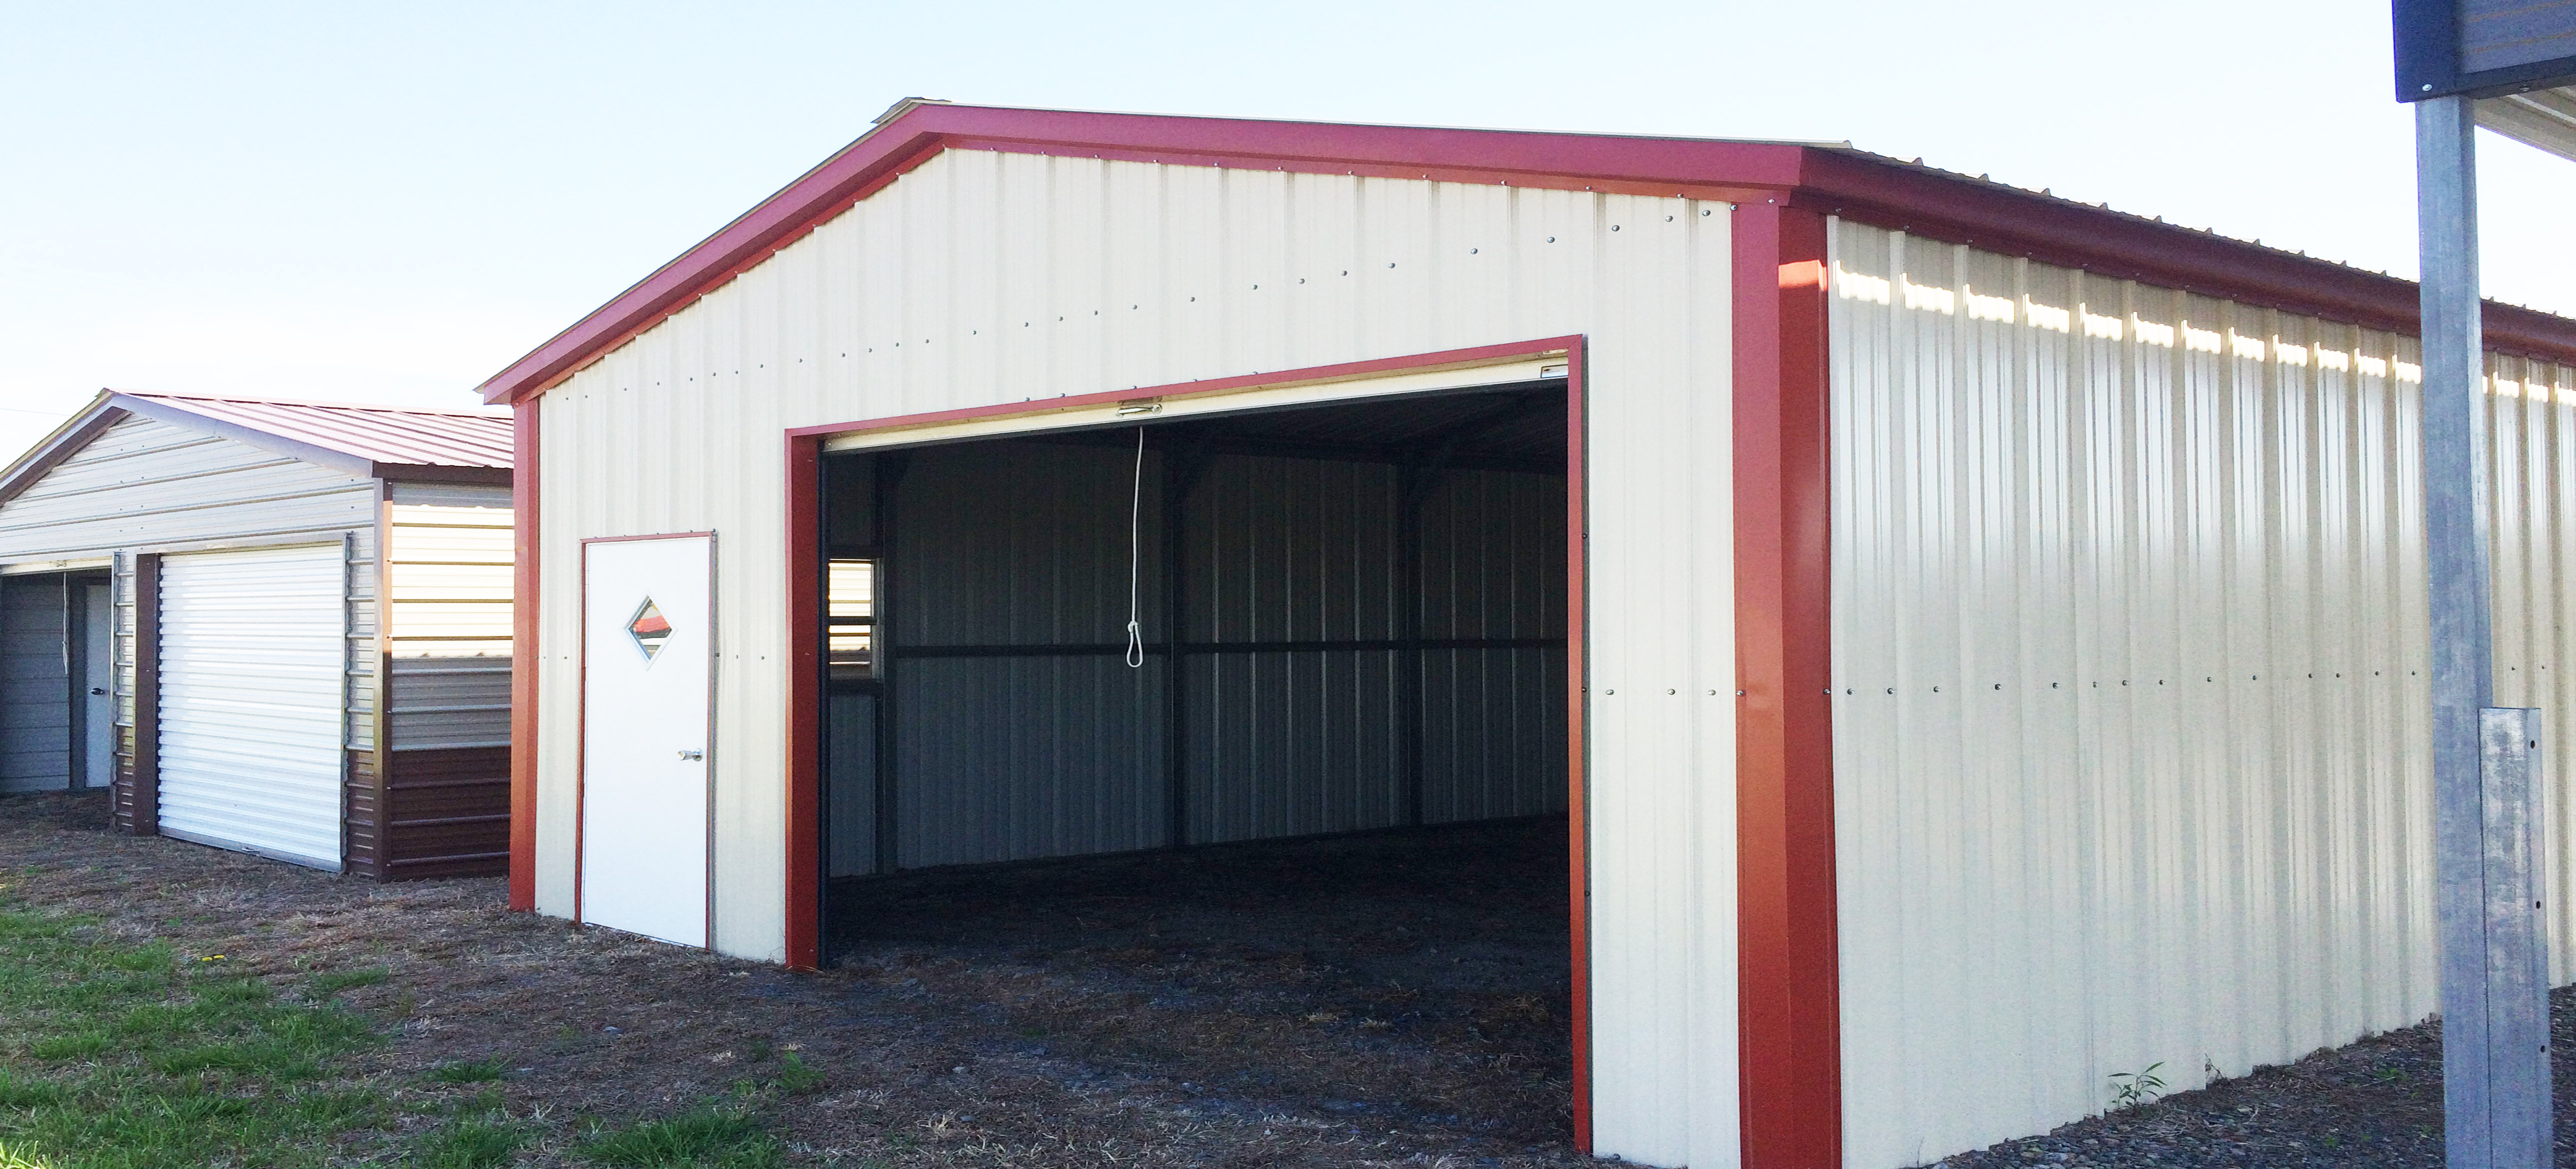 Custom Carport In Kansasjpg Kansas Outdoor Structures